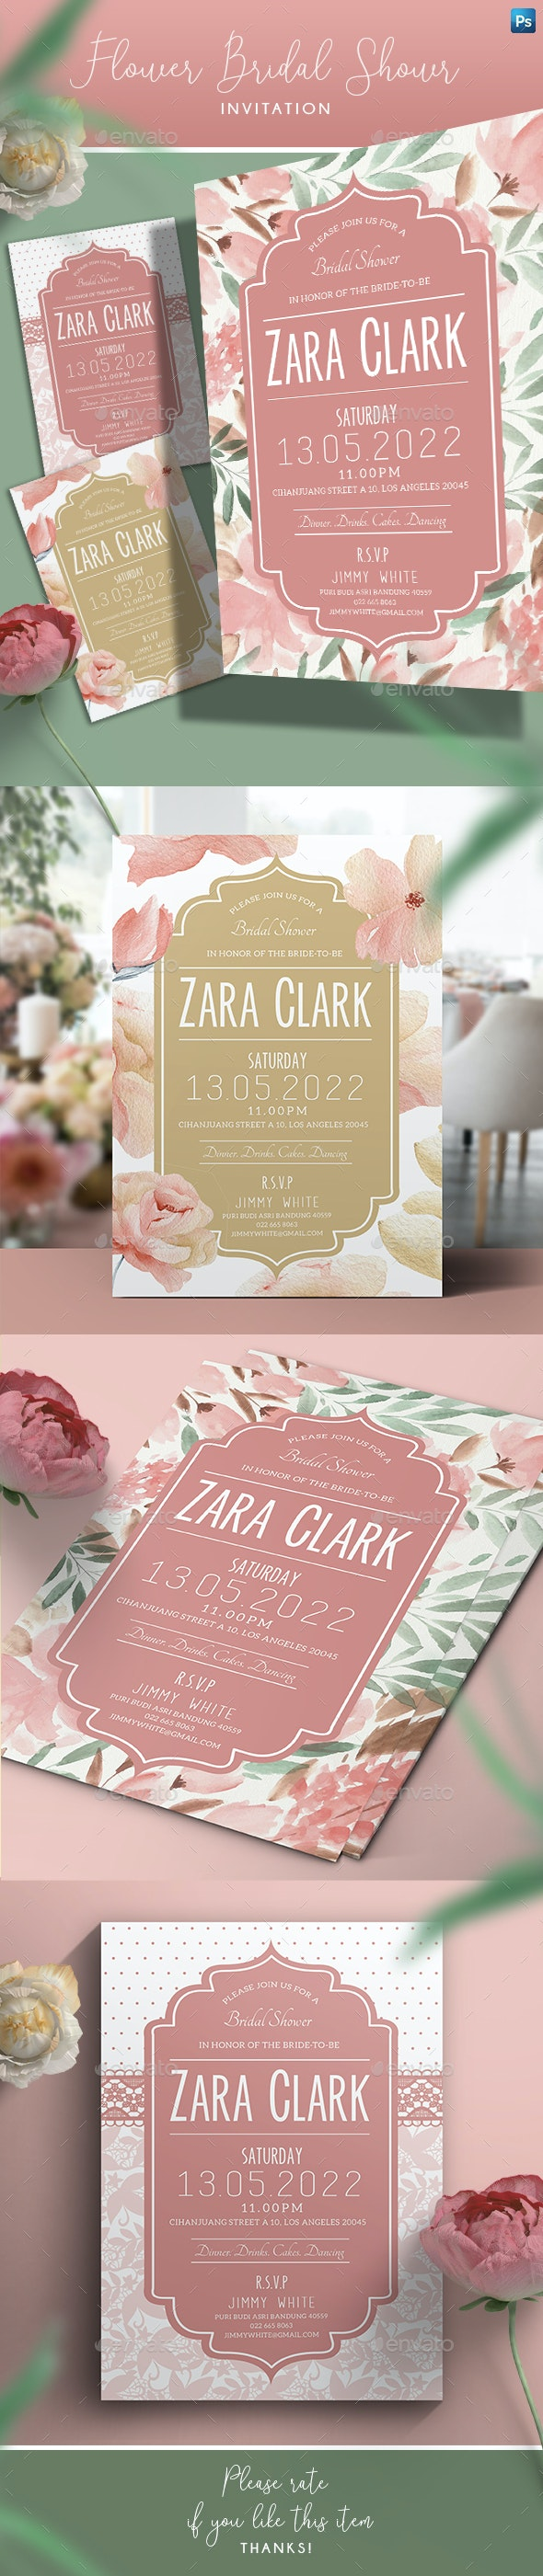 Flower Bridal Shower Invitation - Weddings Cards & Invites